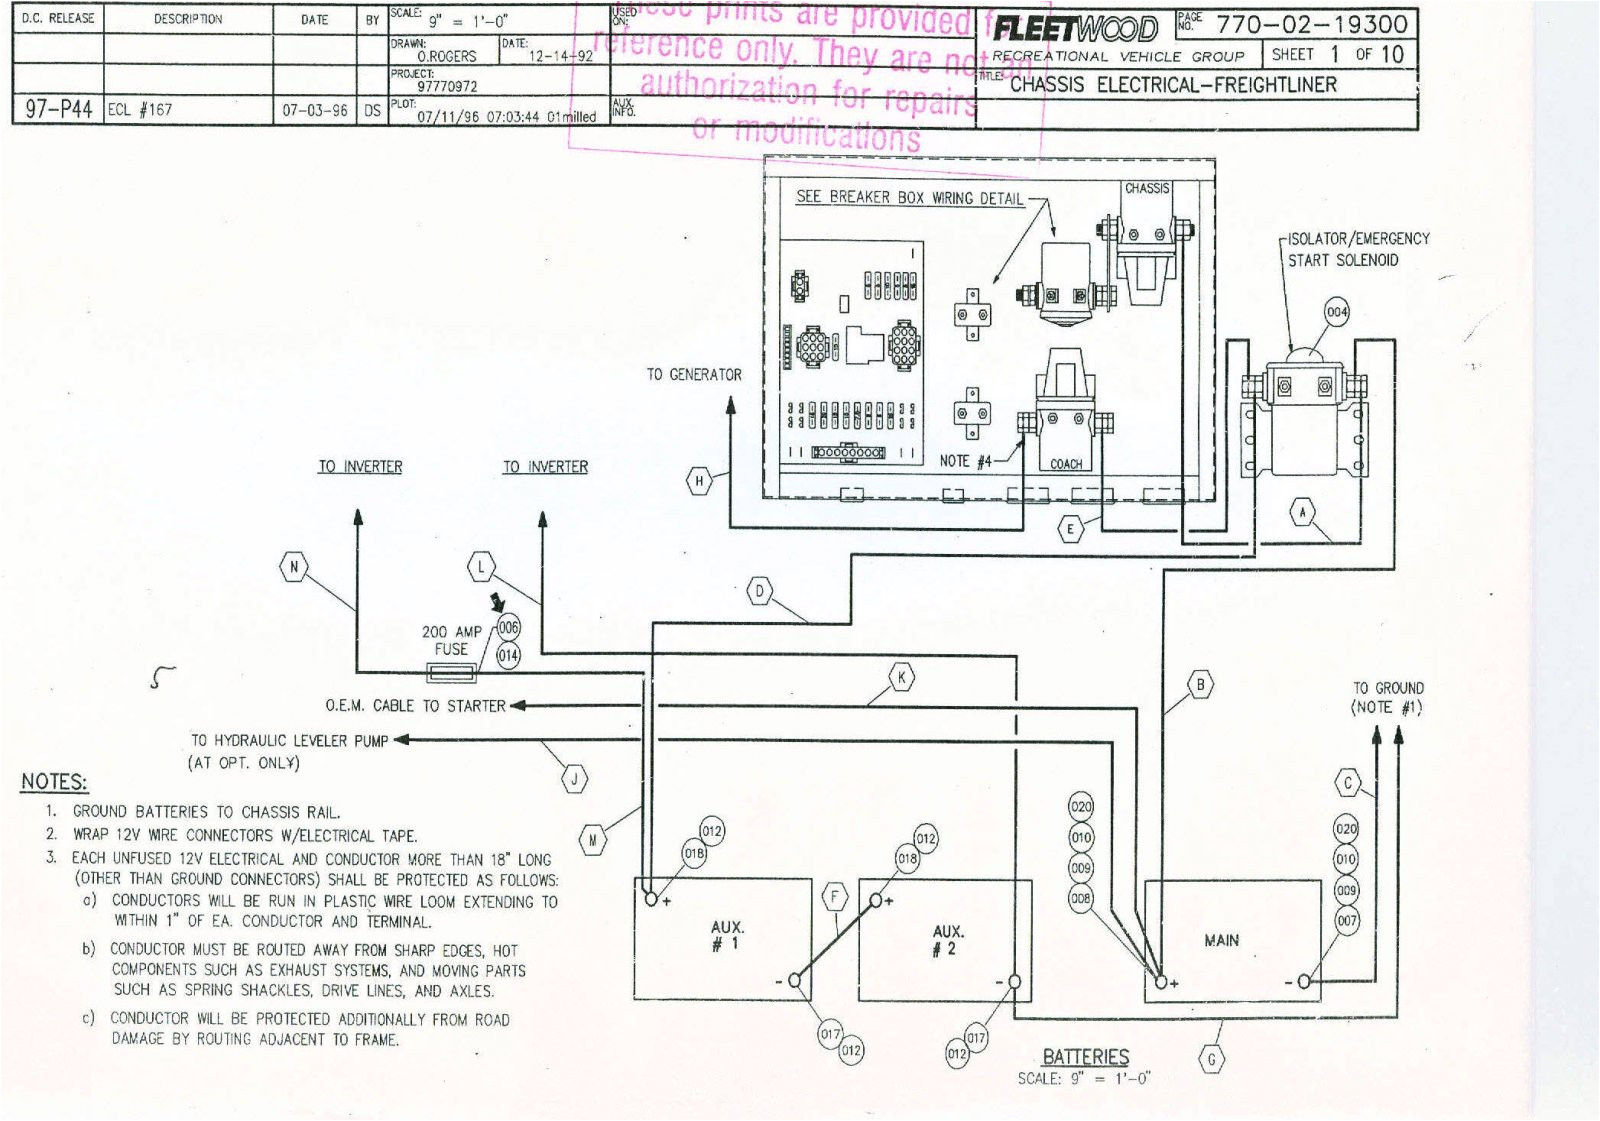 1994 fleetwood bounder wiring diagram wiring diagrams konsult 1994 fleetwood wiring diagram